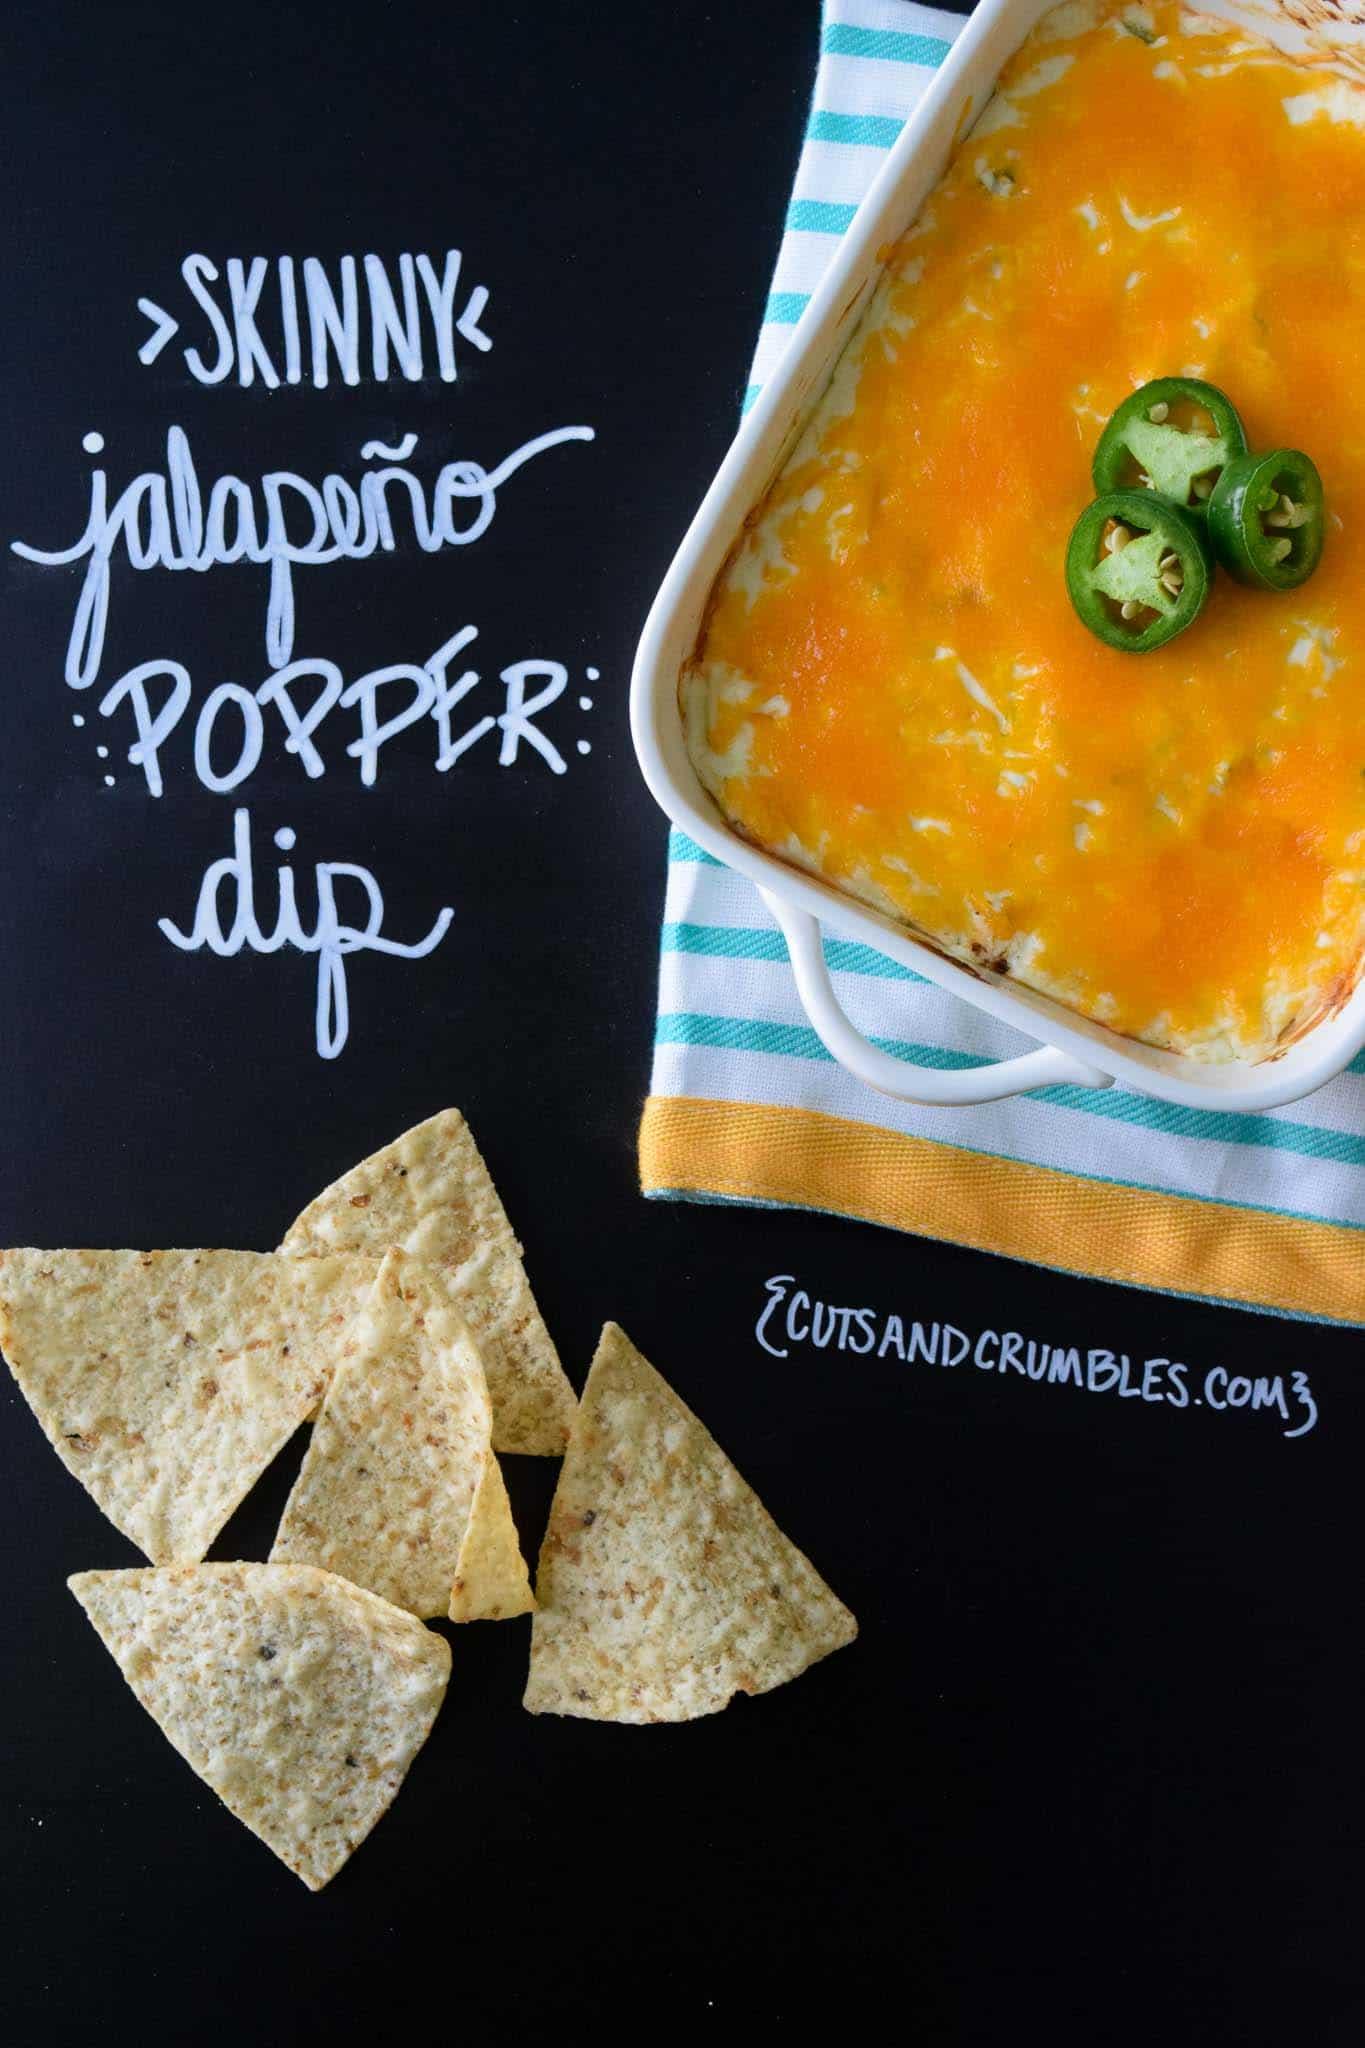 skinny jalapeno pepper dip with title written on chalkboard